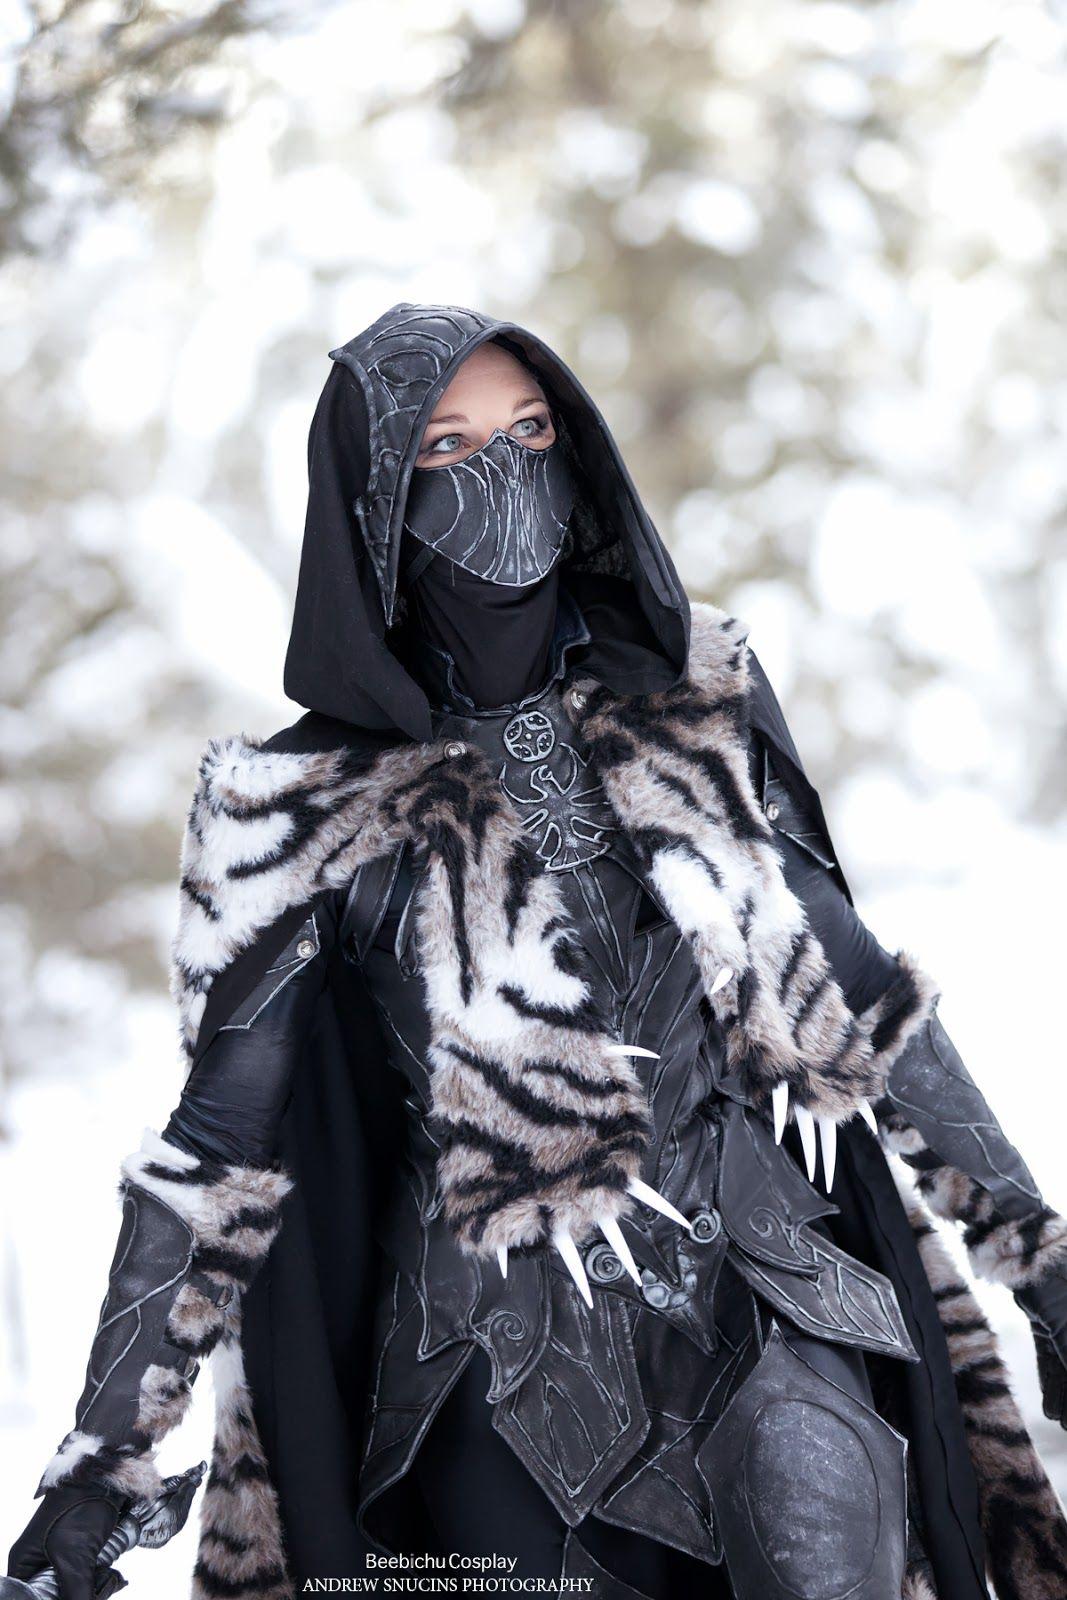 Skyrim Halloween Costume & Daedric Armor Halloween Costume